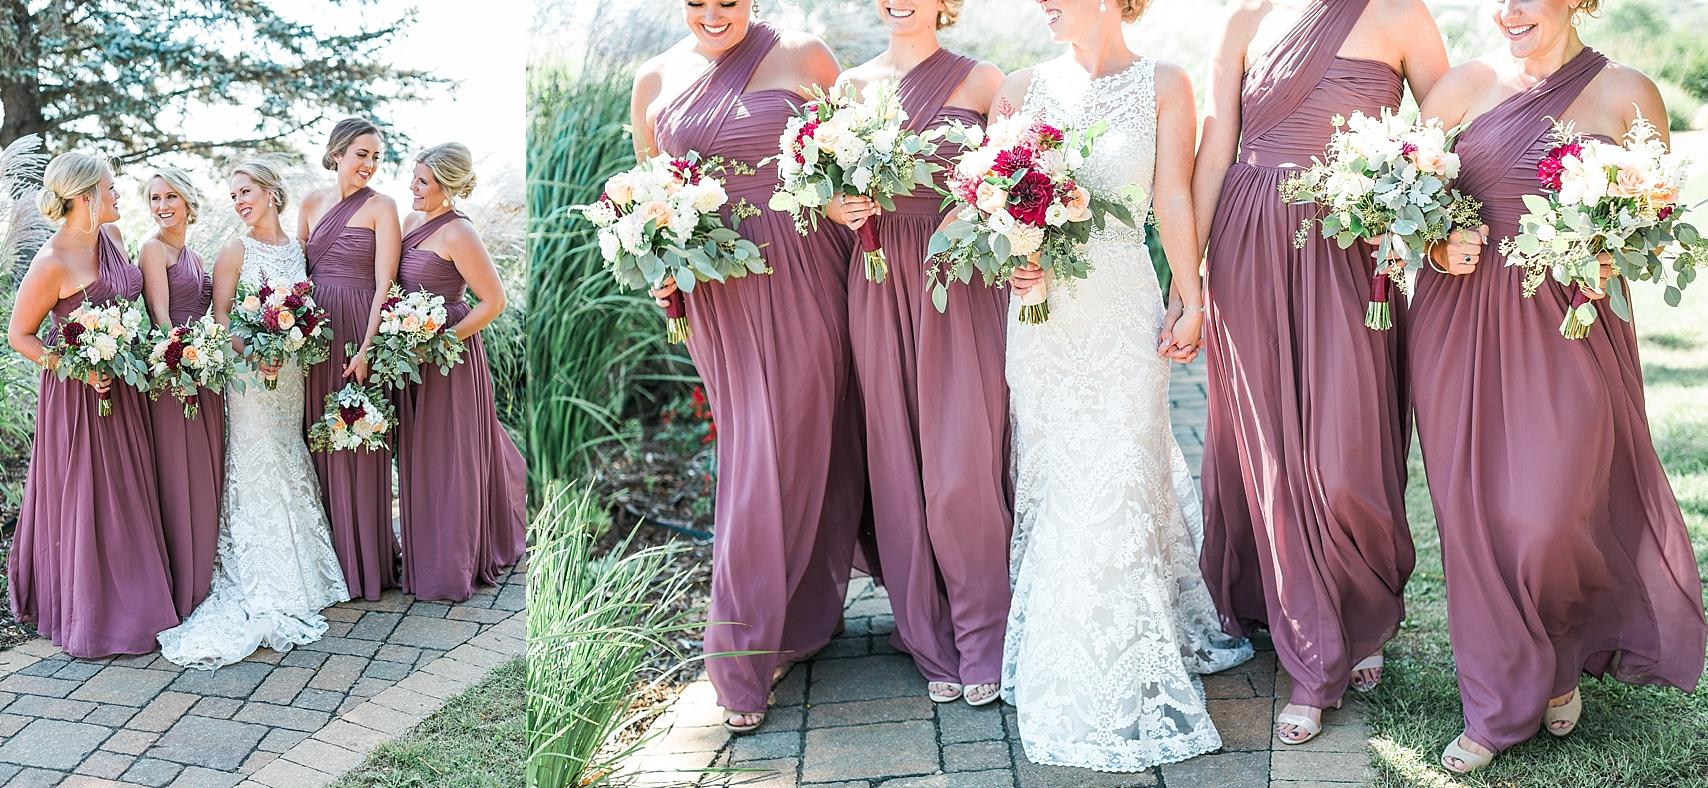 Minnesota Minneapolis Wedding Photographer Best Of 2018 Weddings Mallory Kiesow Photography_0100.jpg